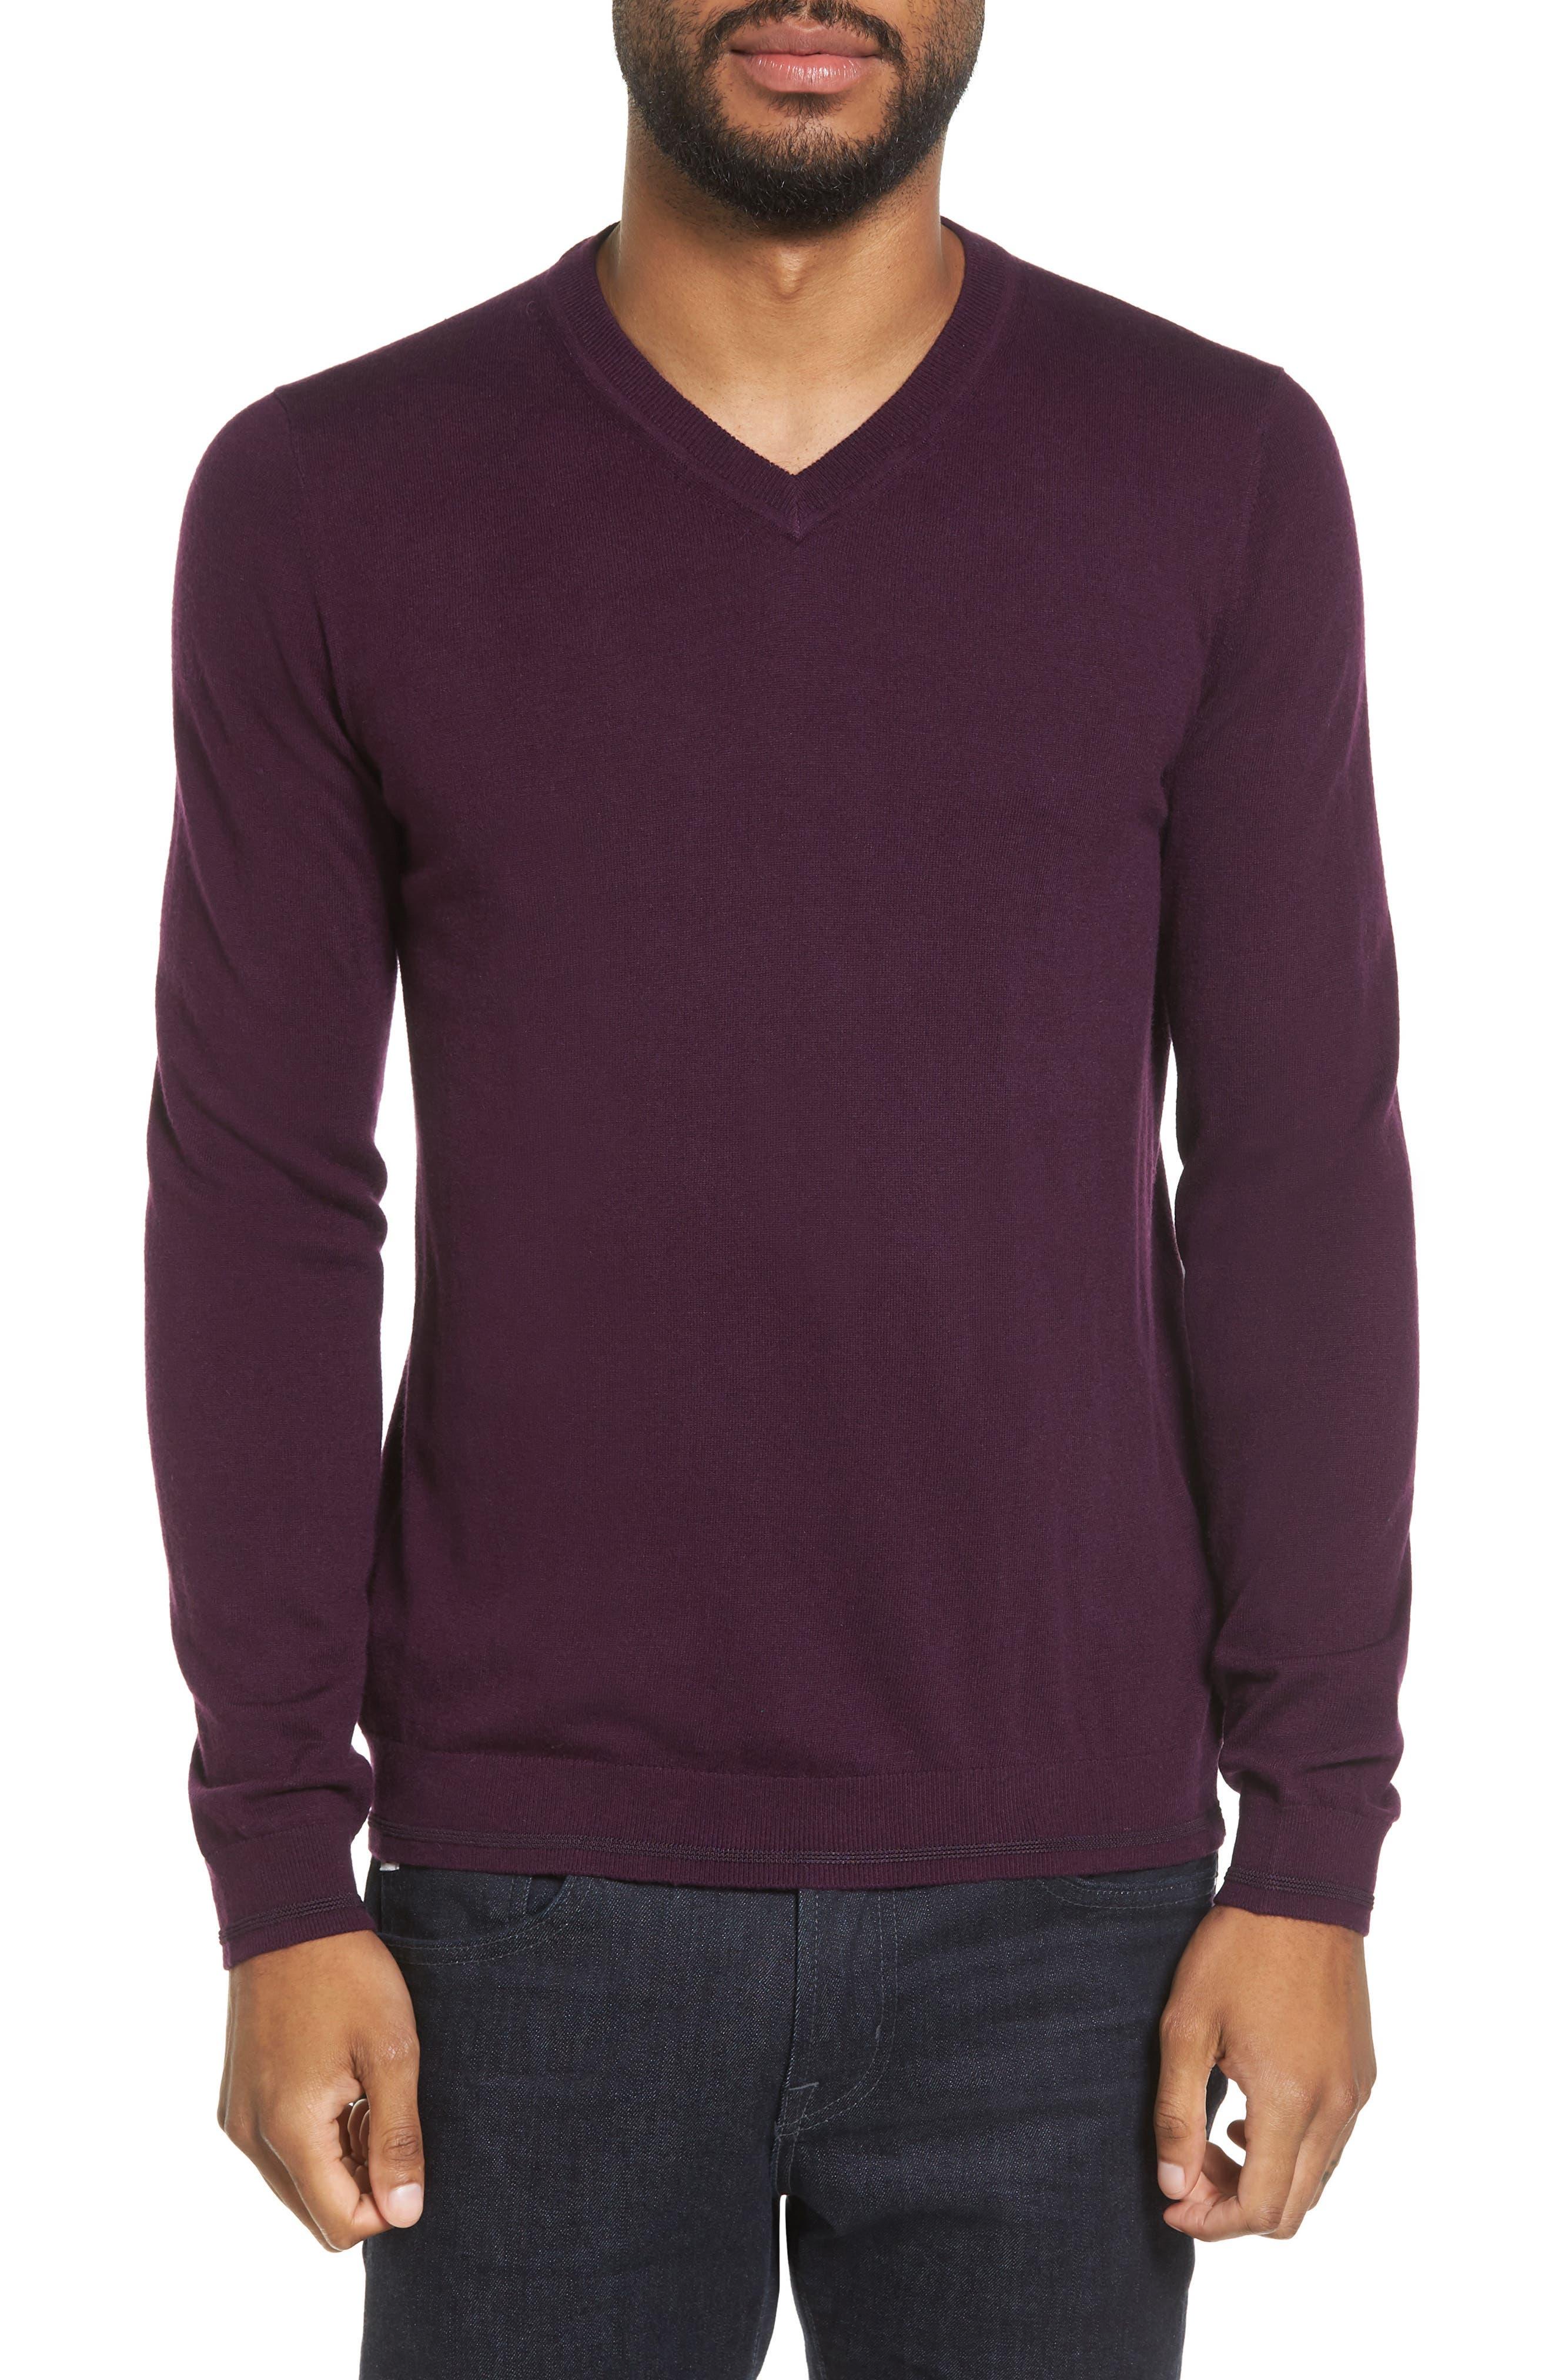 Alternate Image 1 Selected - Ted Baker London V-Neck Sweater